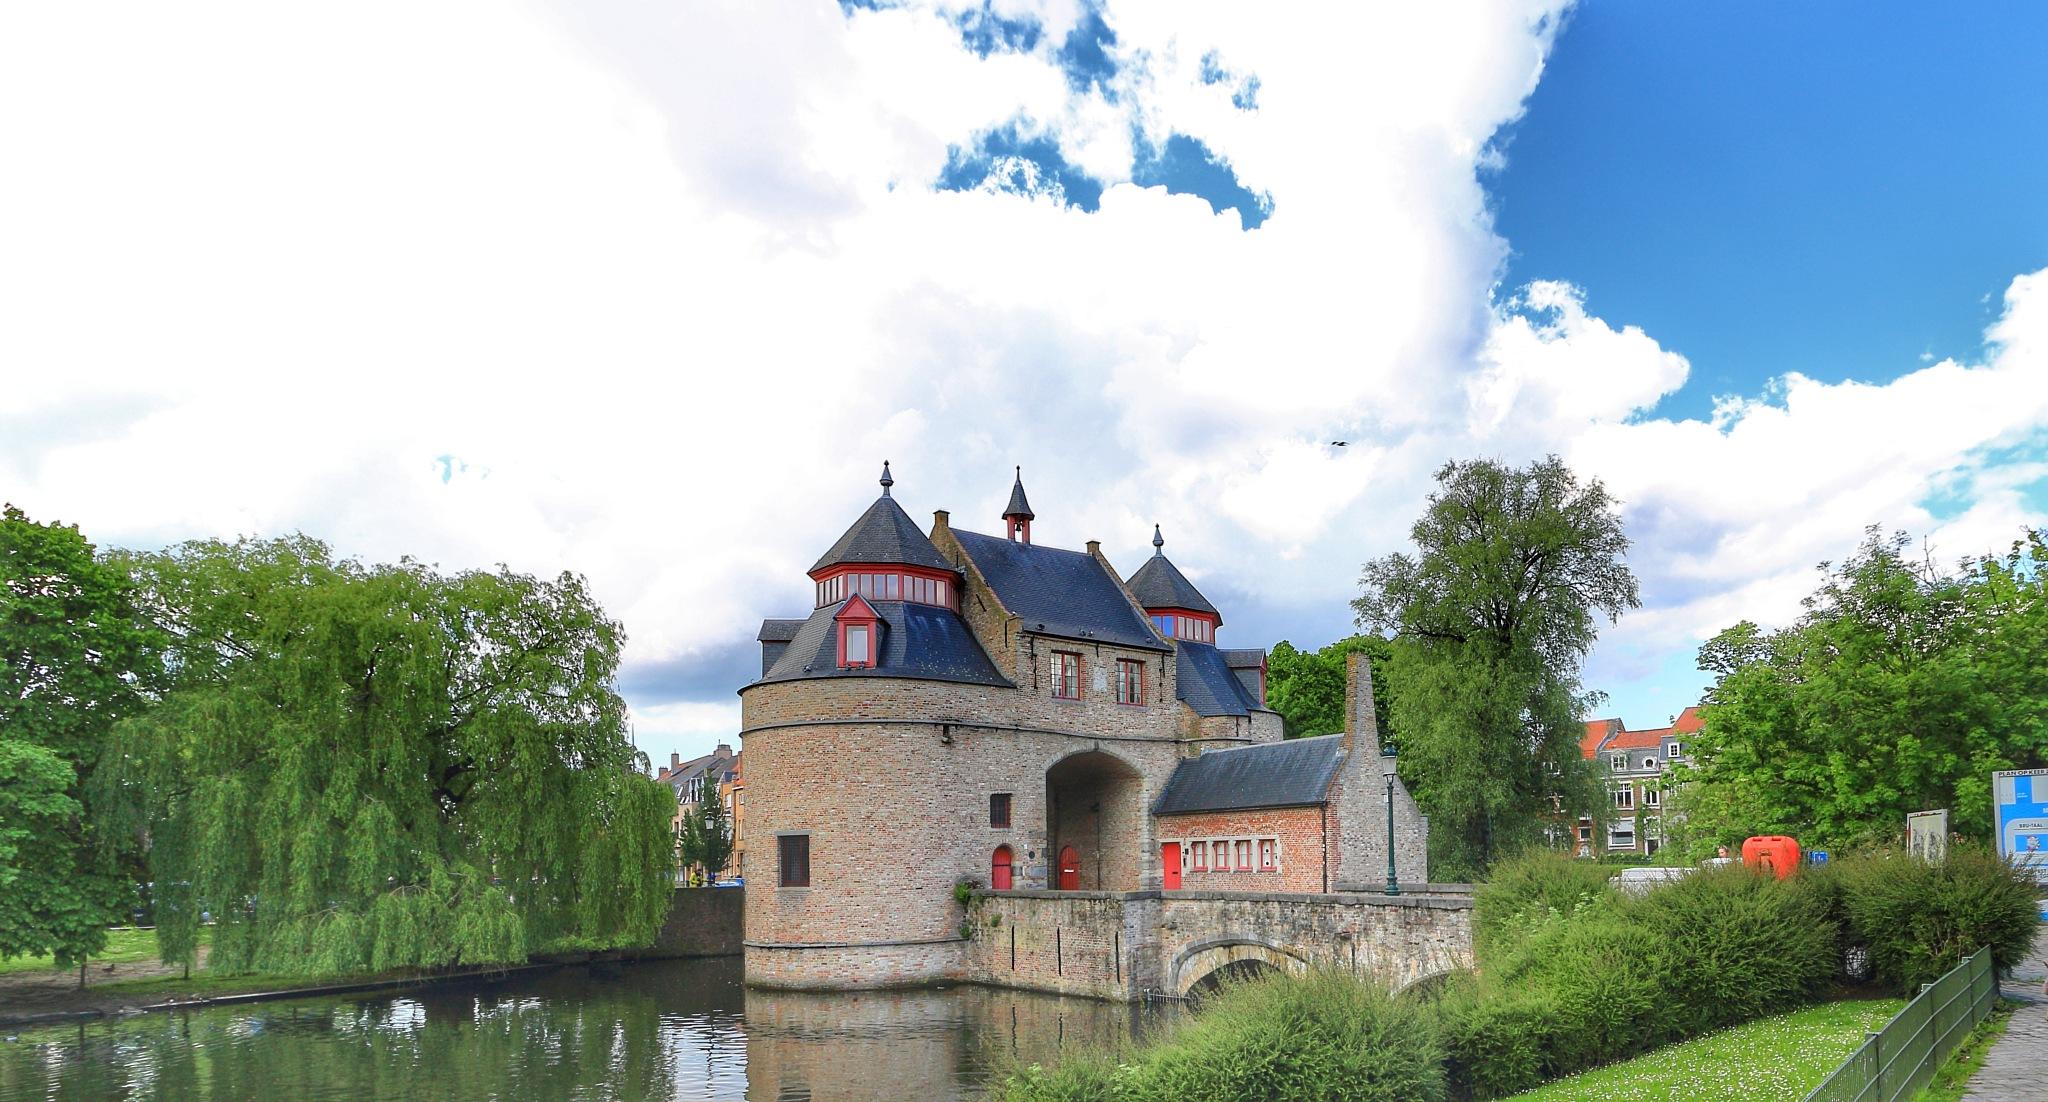 Bruges by samall